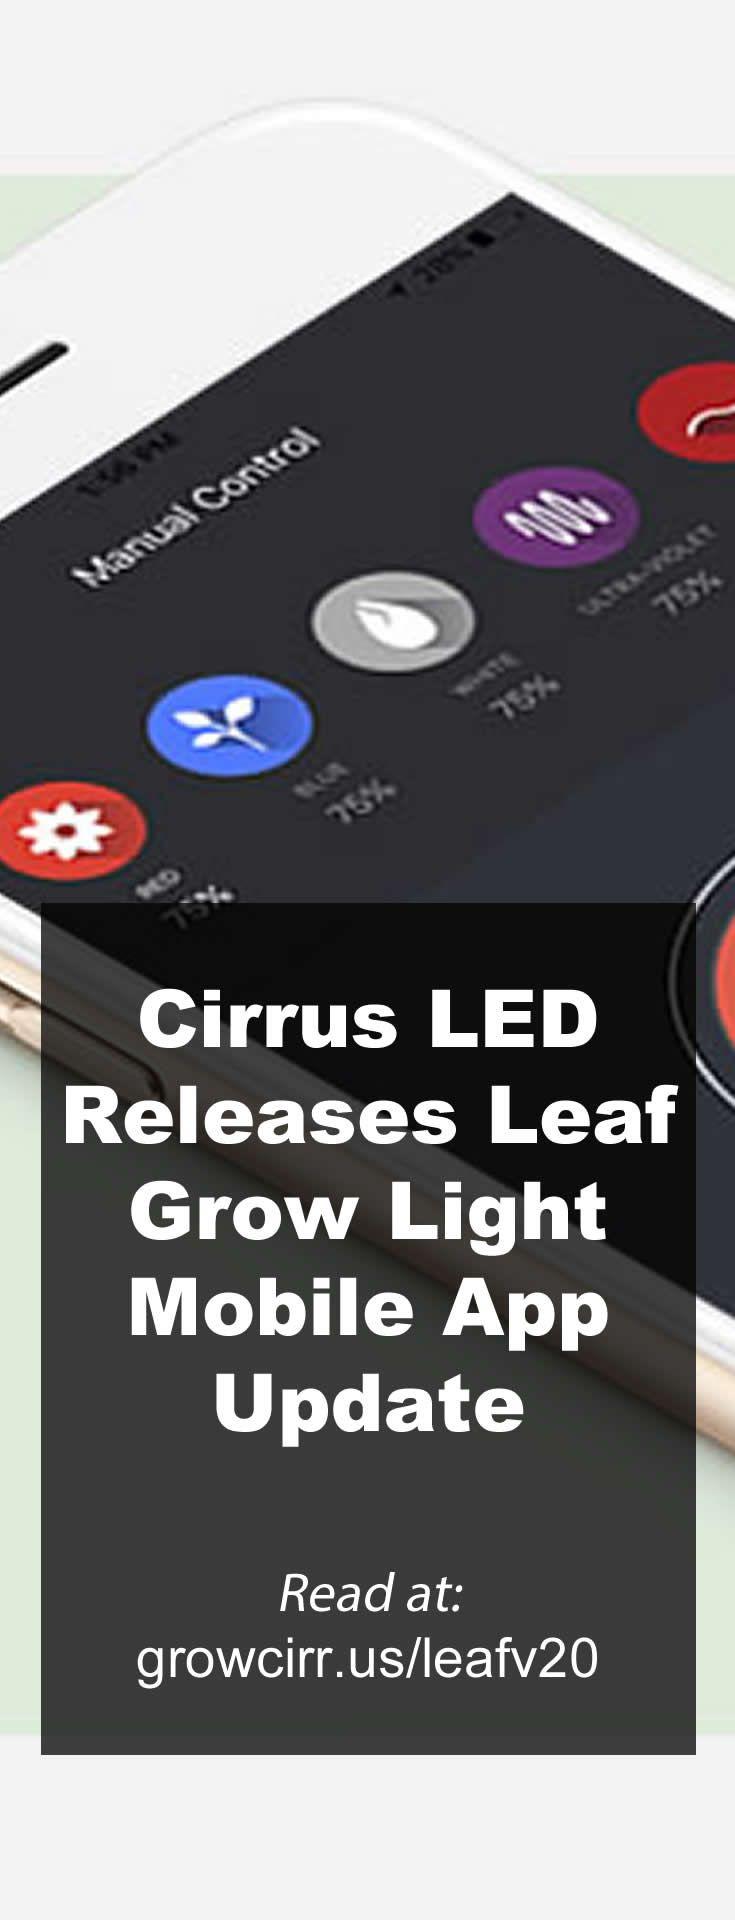 Cirrus LED Releases Leaf Grow Light Mobile App Update